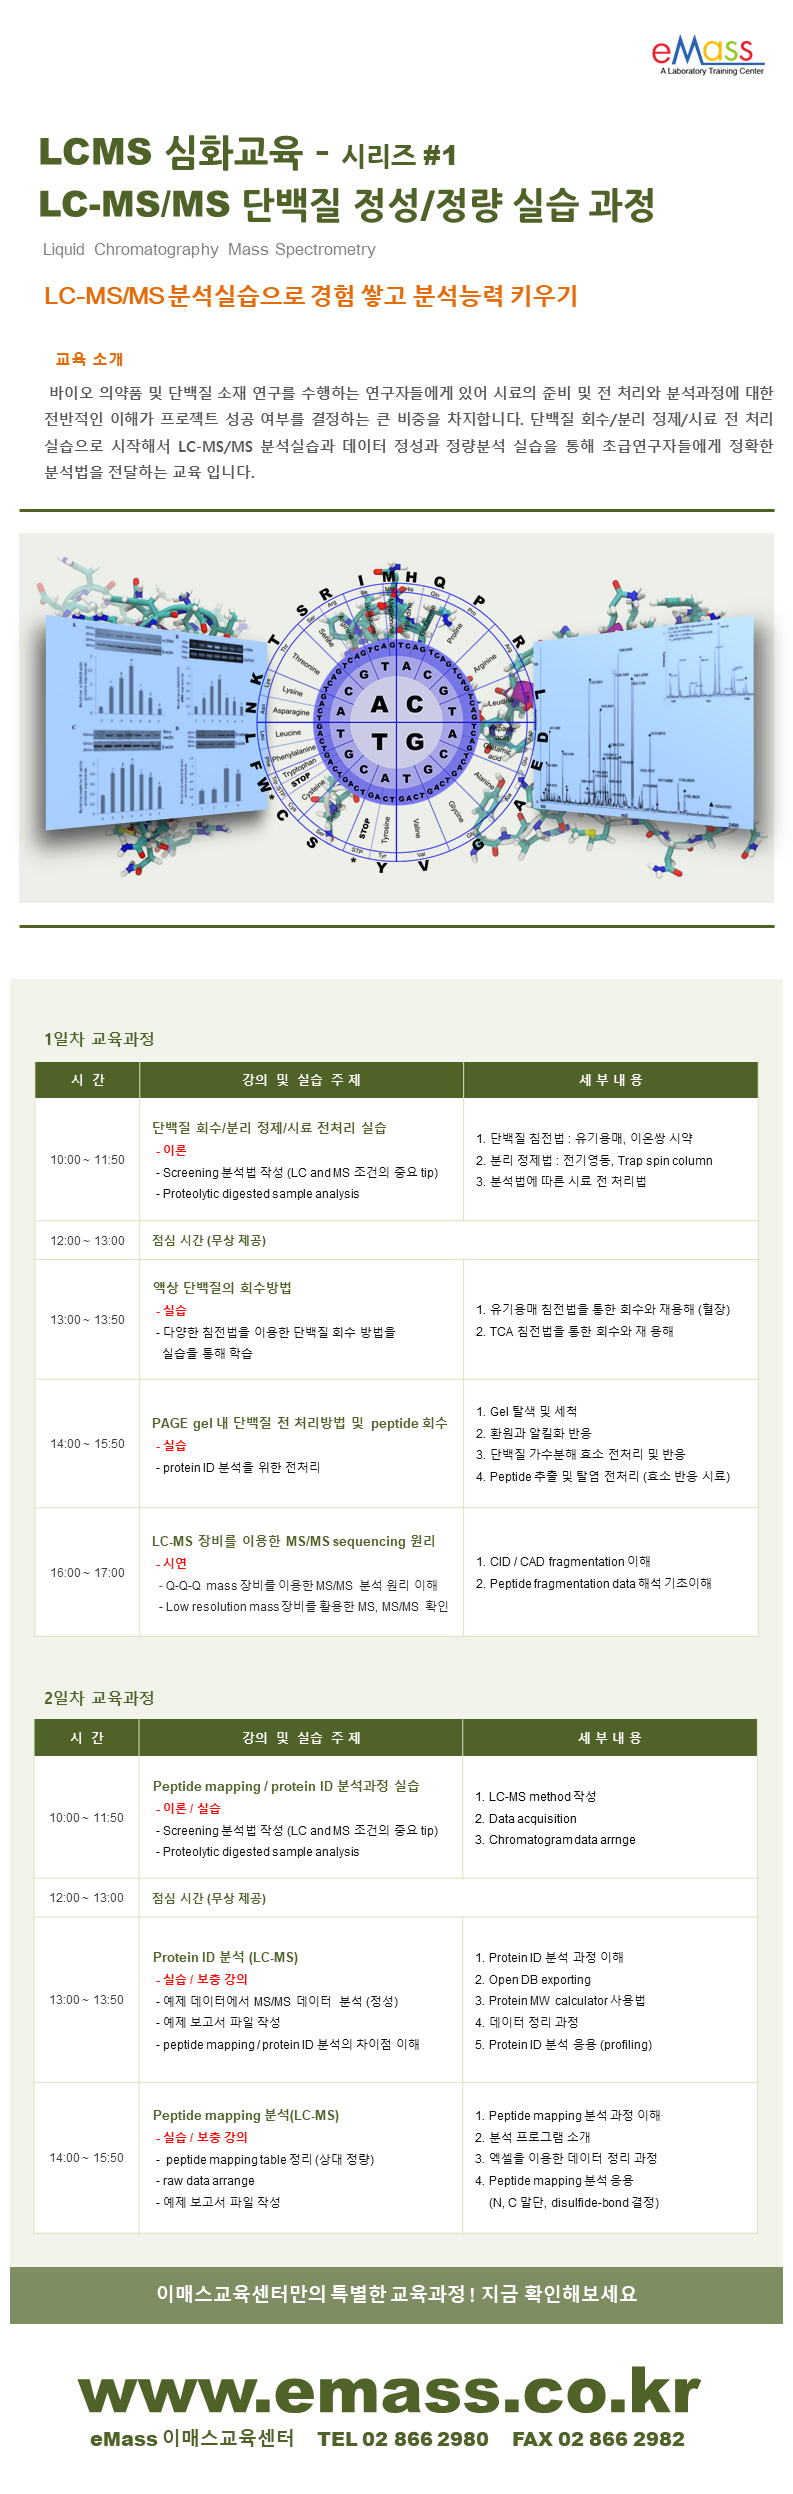 LCMS 심화교육_단밸질 정성정량 실습 과정.png